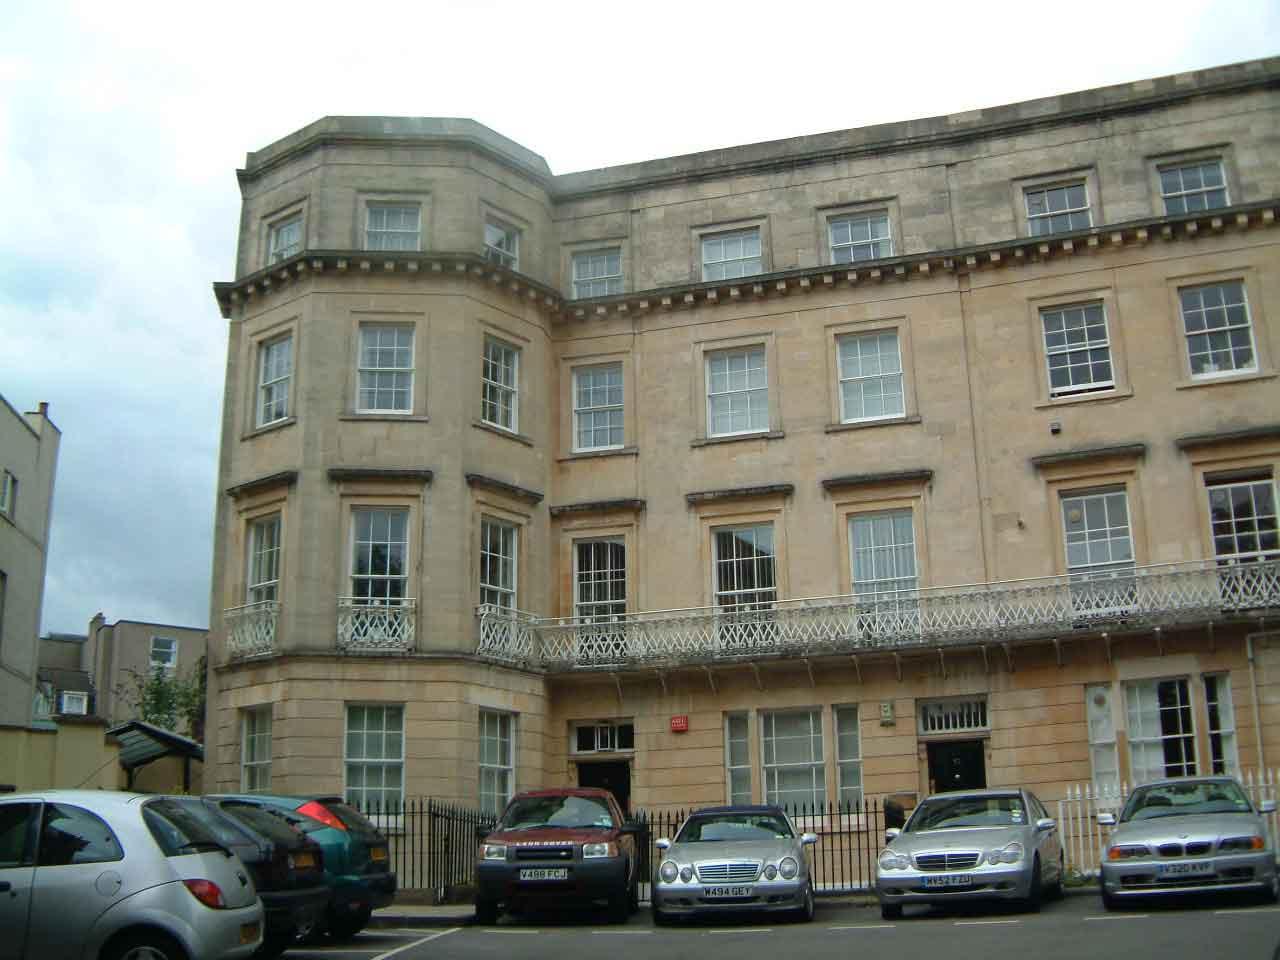 Saville Court Business Centre - Saville Place, BS8 - Clifton - Bristol